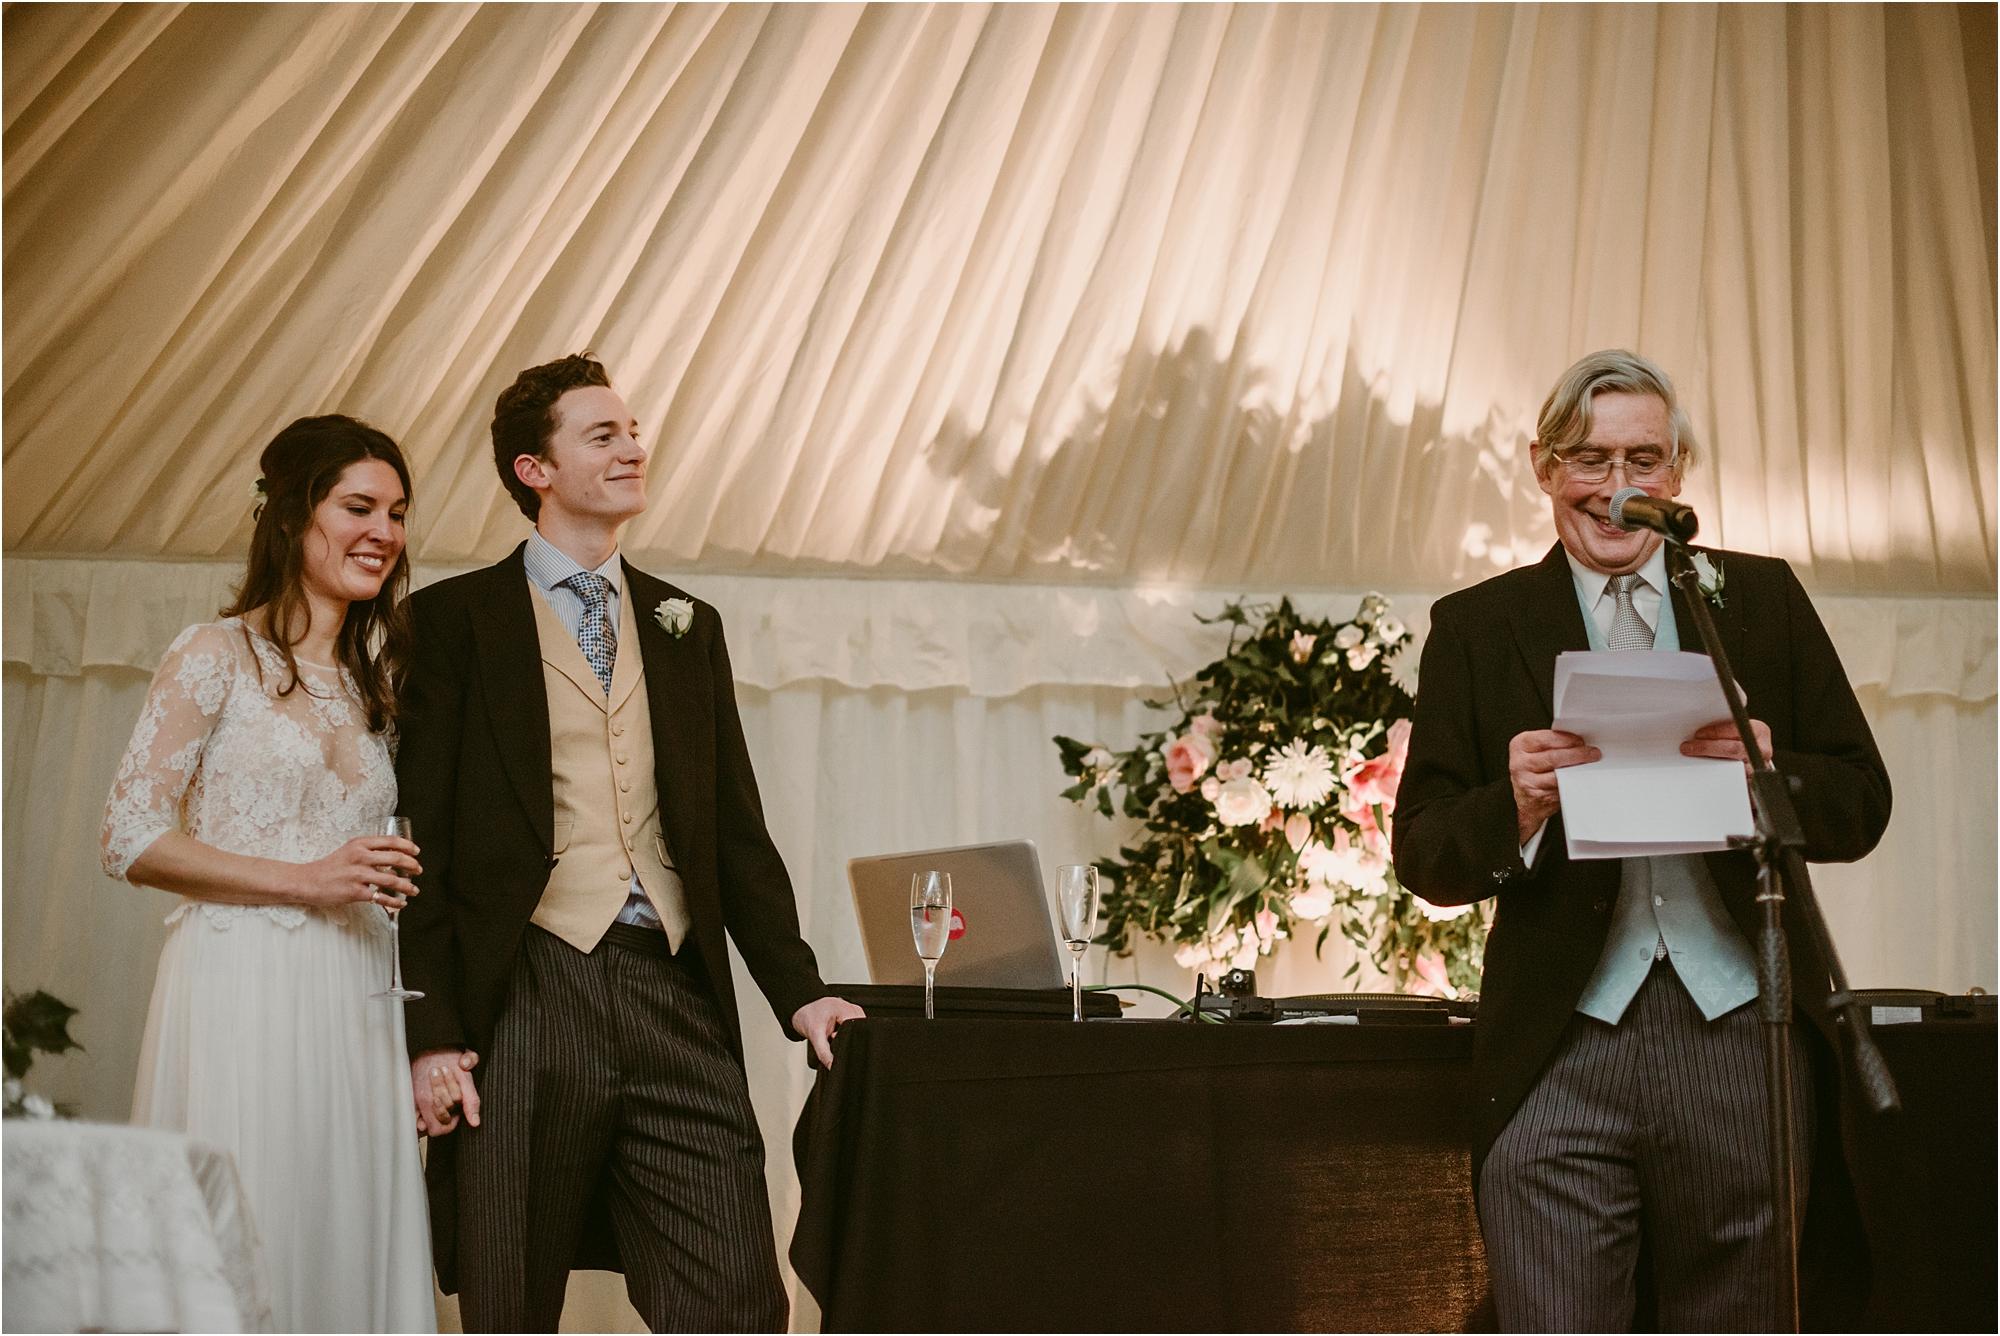 Rose+Harry-outdoor-english-wedding-photography__0096.jpg